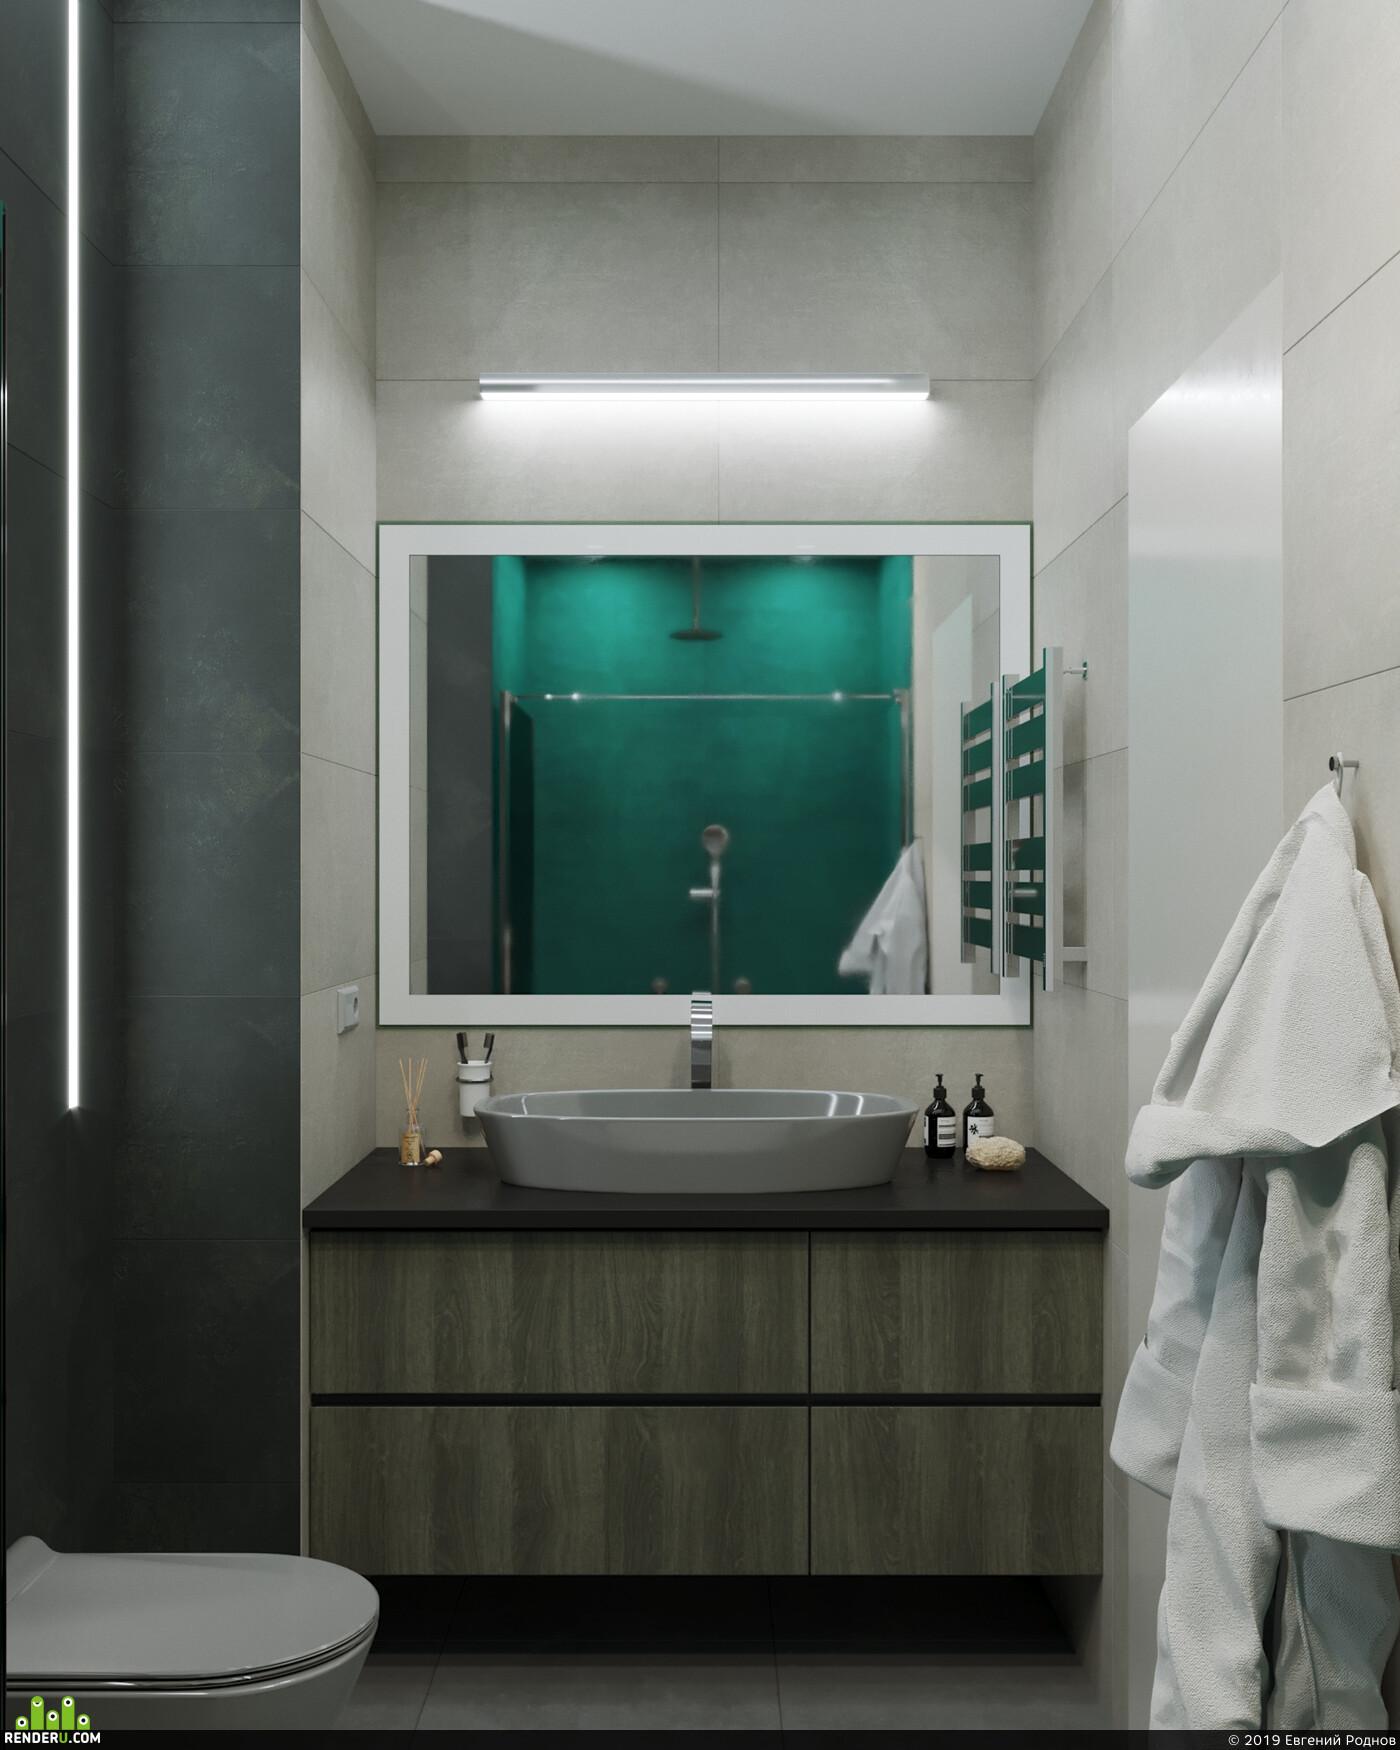 гостиная, кухня, ванная комната, рендерер, коронарендер